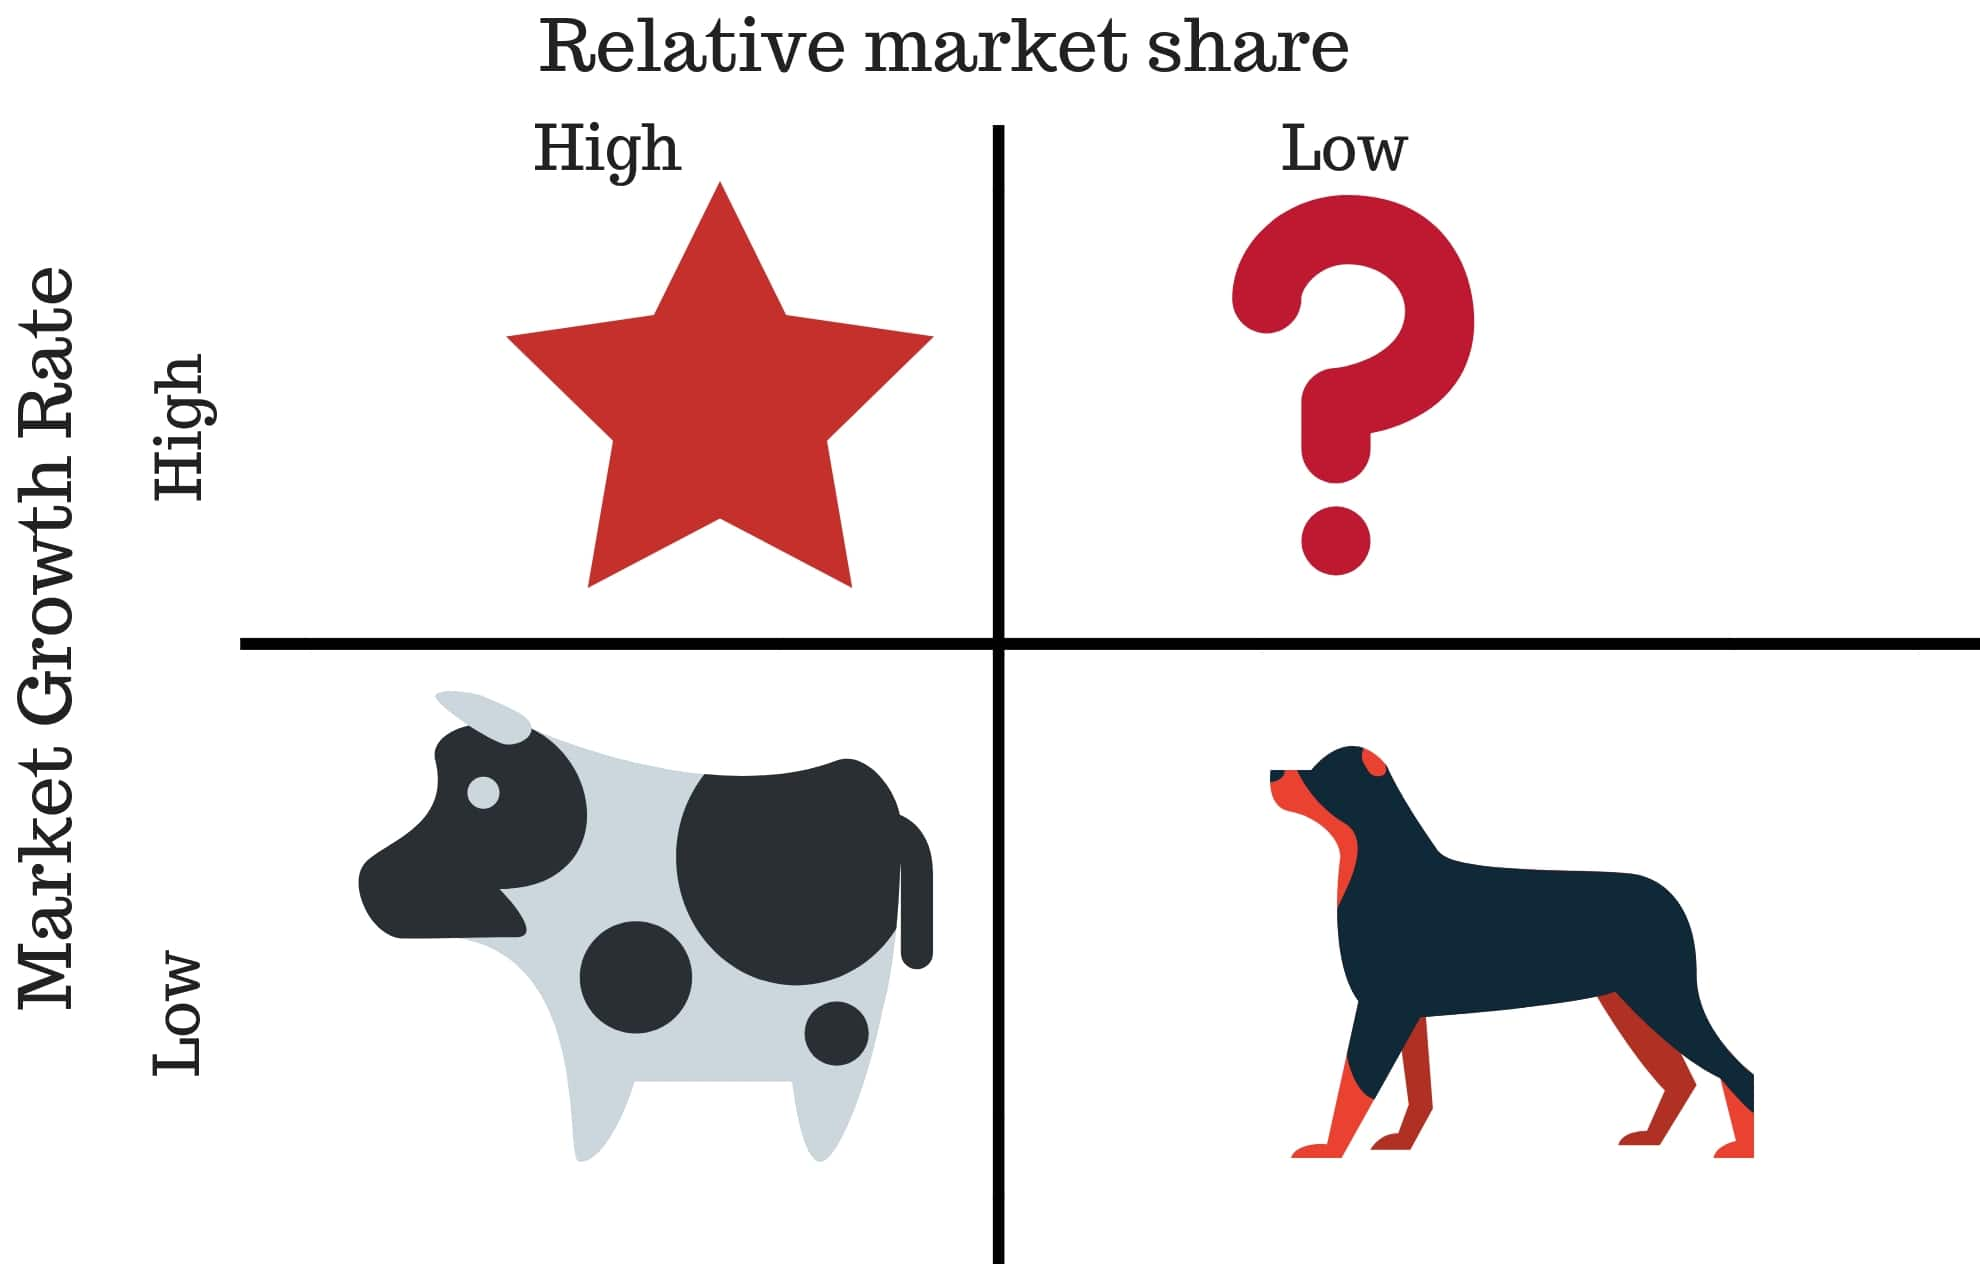 bcg matrix analysis boston consulting group